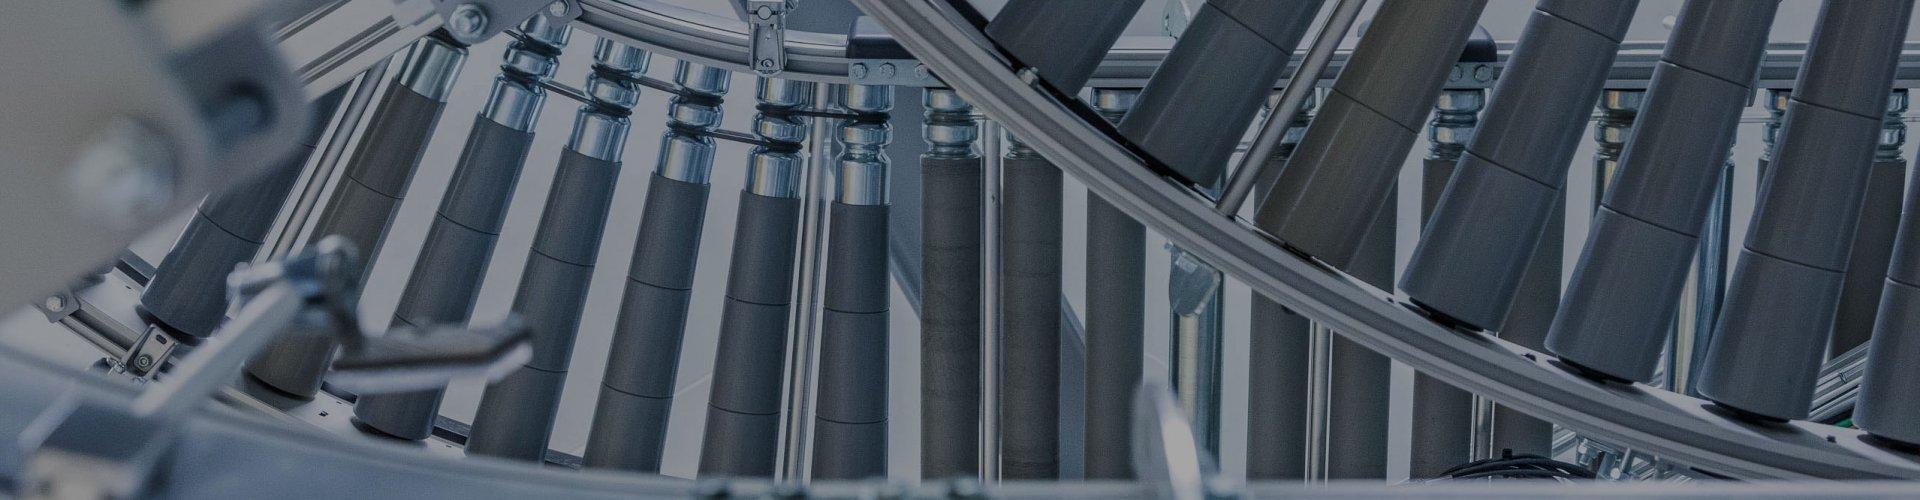 Interactieve Presentatie Easy Conveyors - PPT Solutions